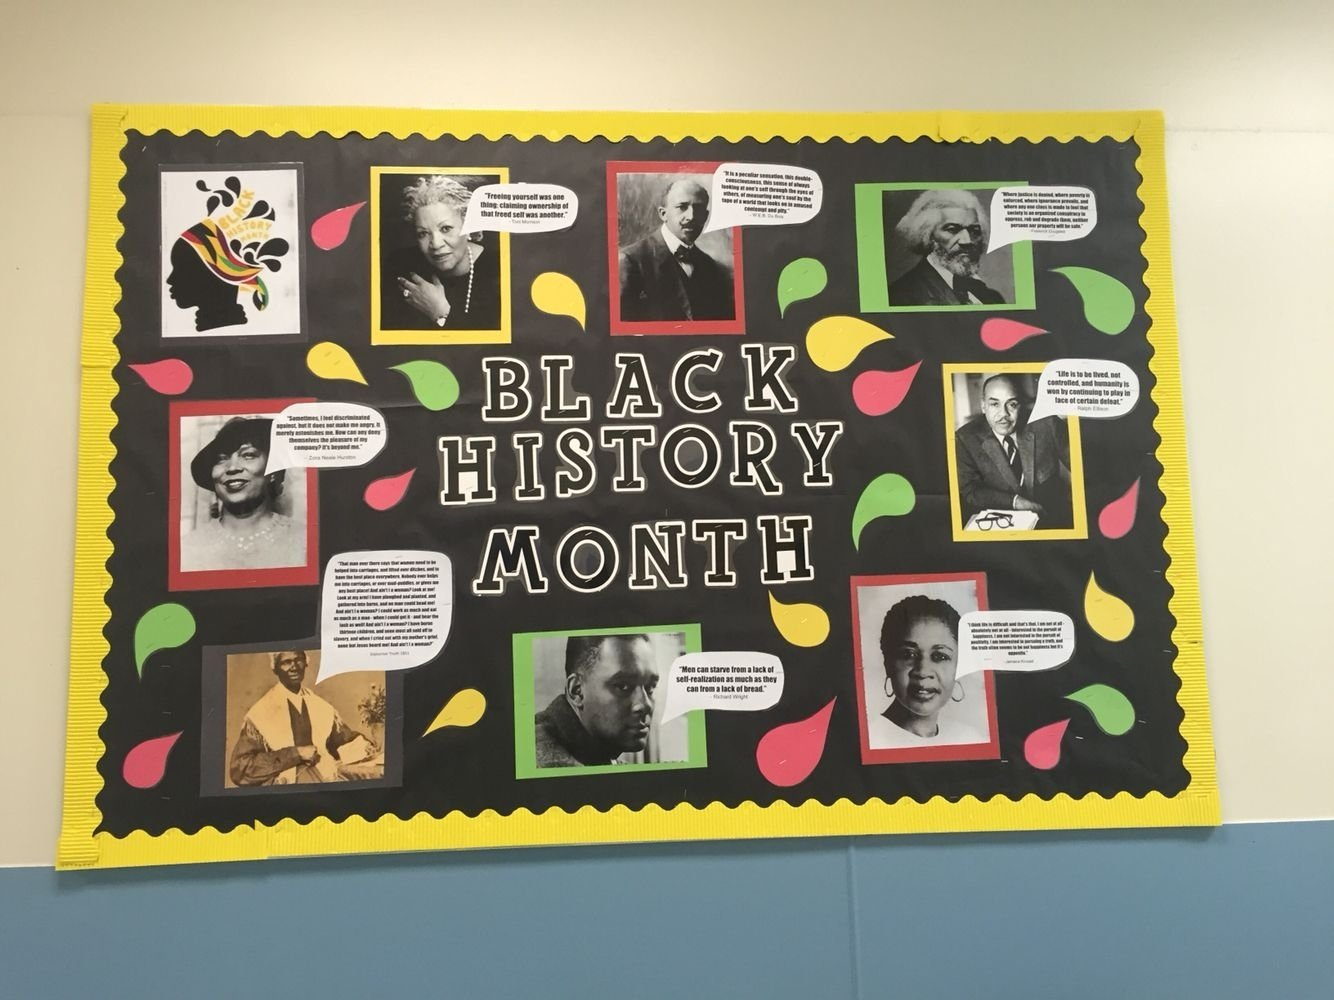 10 Fabulous Black History Month Bulletin Board Ideas black history month bulletin board nailed it pinterest black 2021